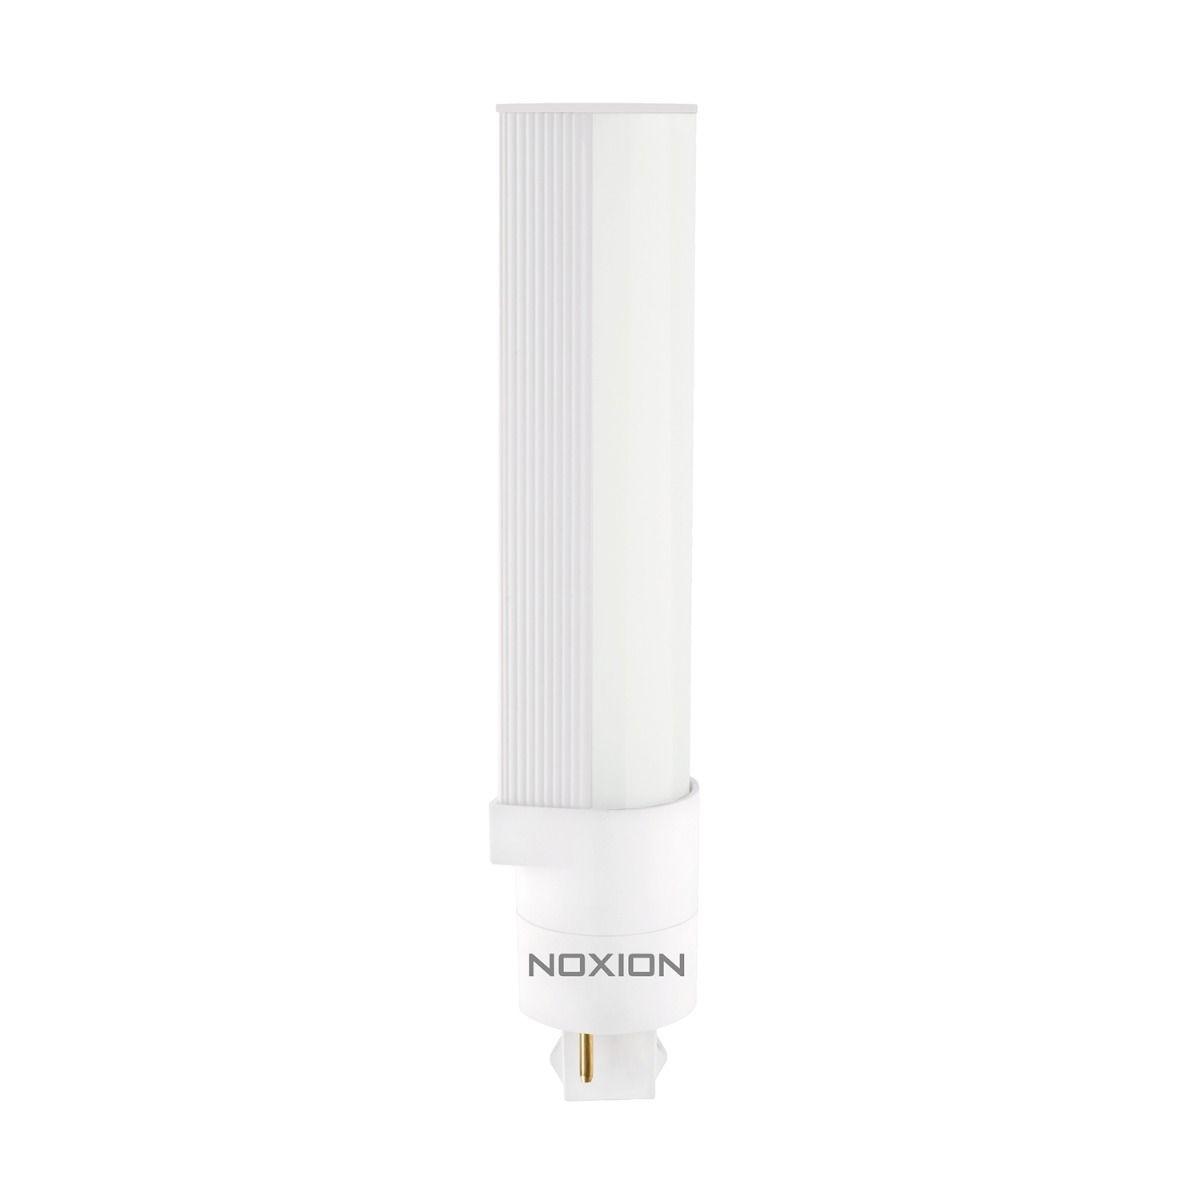 Noxion Lucent LED PL-C EM 6.5W 830   650 Lumen - 2-Pins - Ersatz für 18W